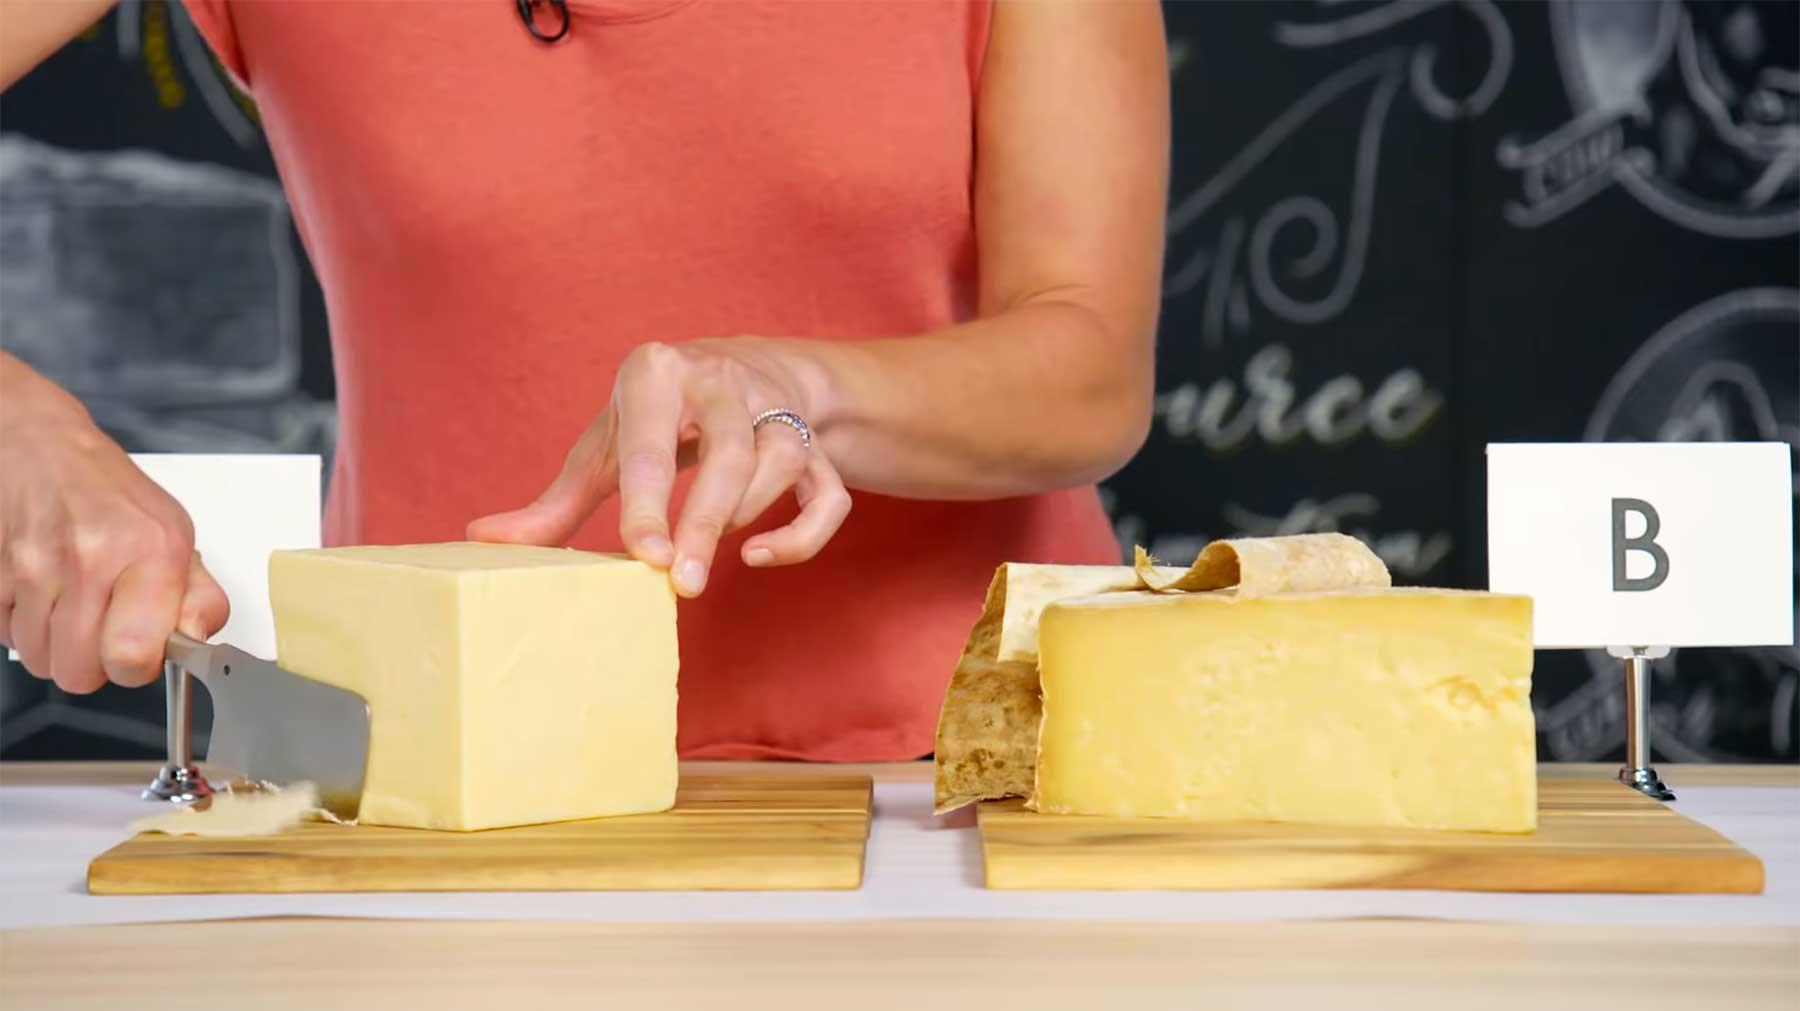 Expertin erklärt, woran man guten Käse erkennt